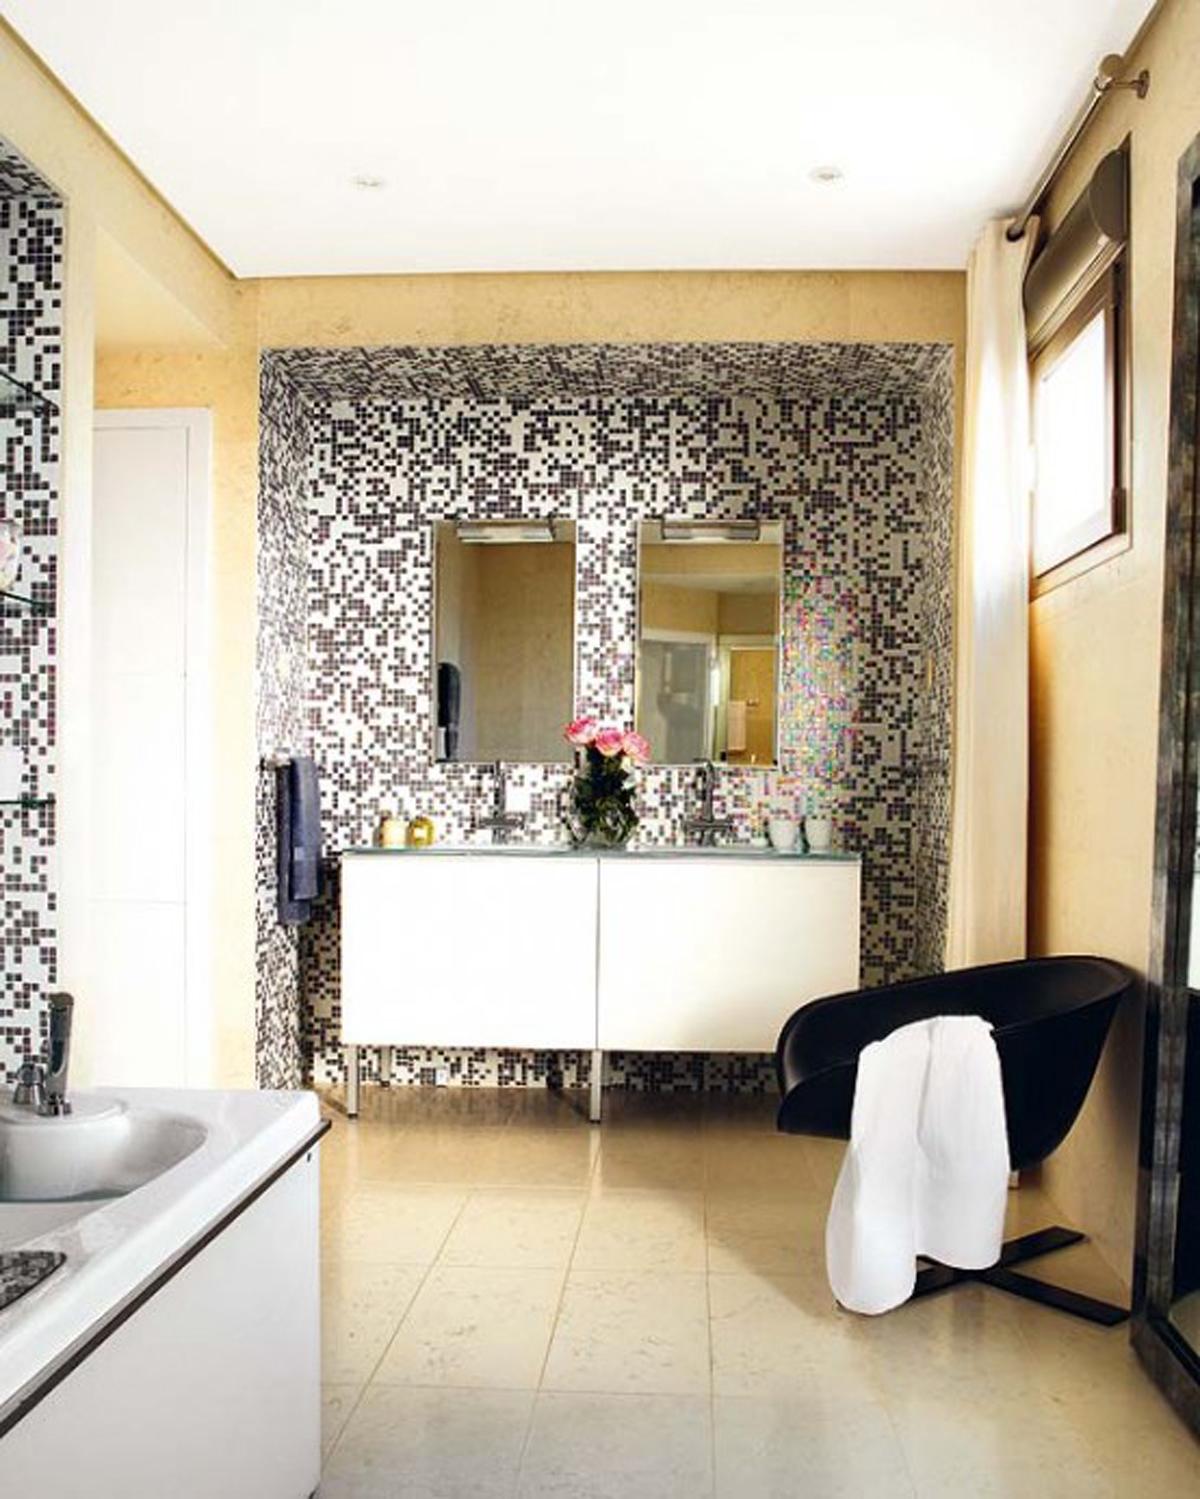 25 Wonderful Large Glass Bathroom Tiles 2019